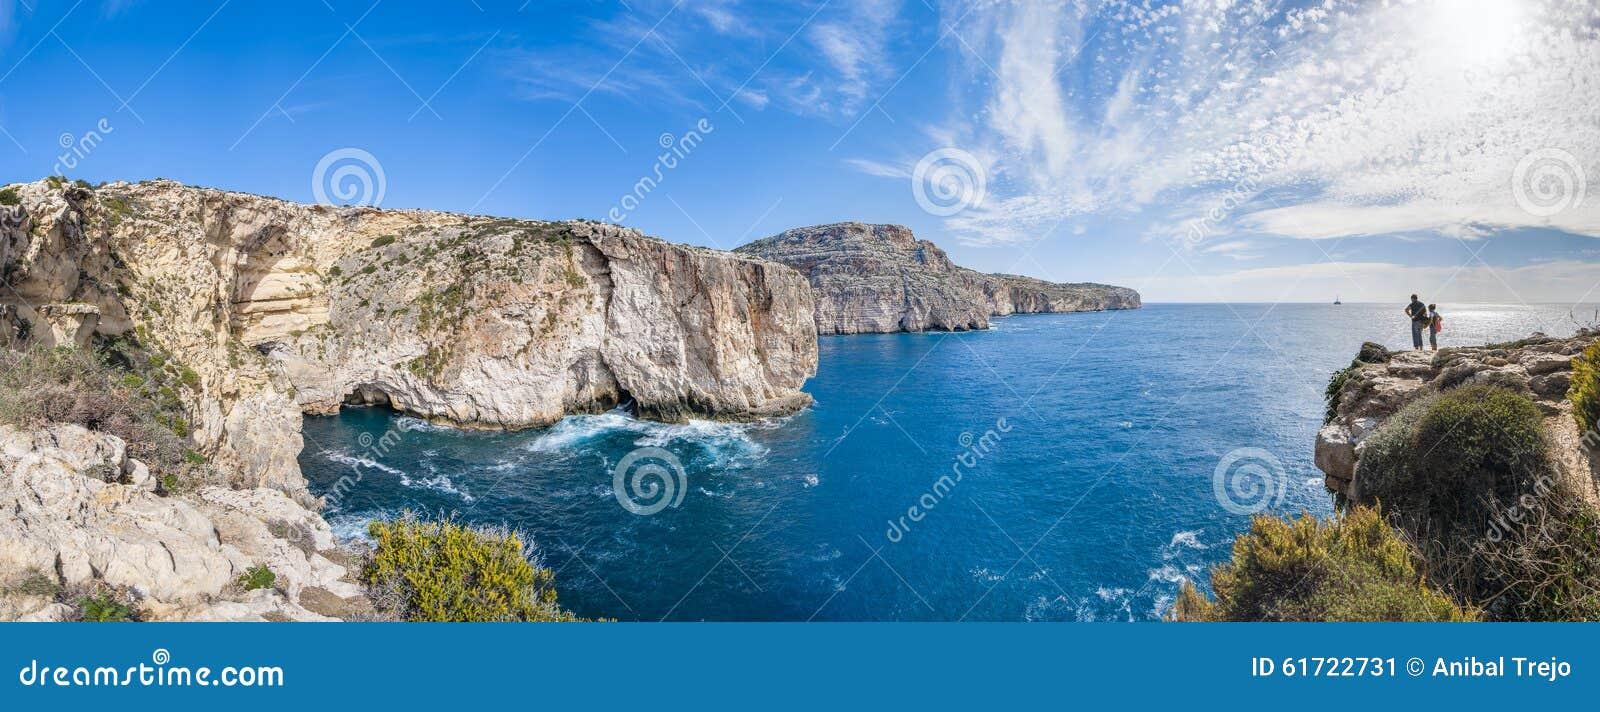 Dingli falezy w Malta